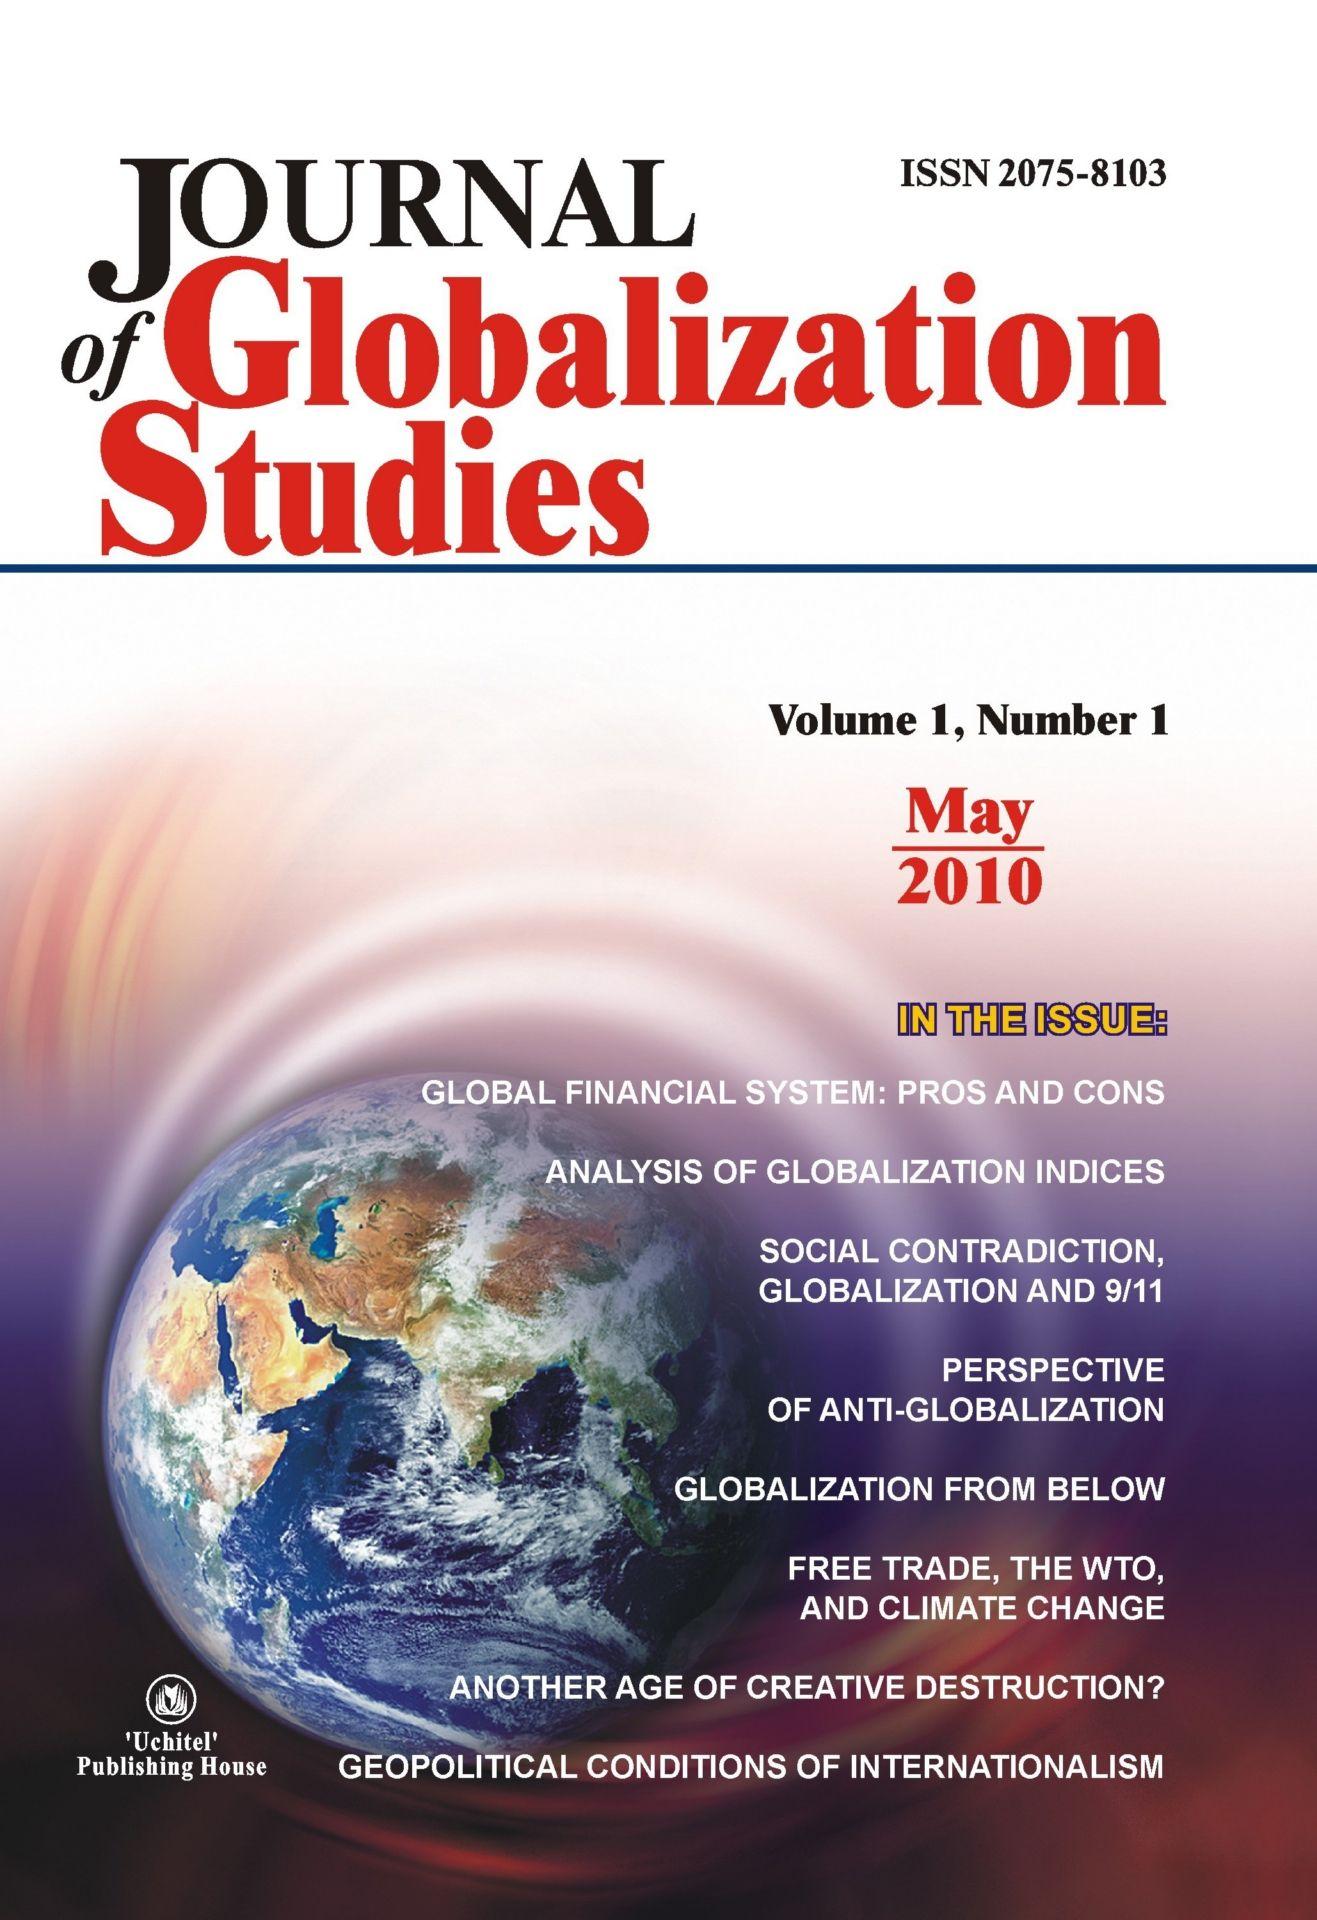 Journal of Globalization Studies Volume 1, Number 2010 г. Журнал глобализационных исследований Международный журнал на английском языке.